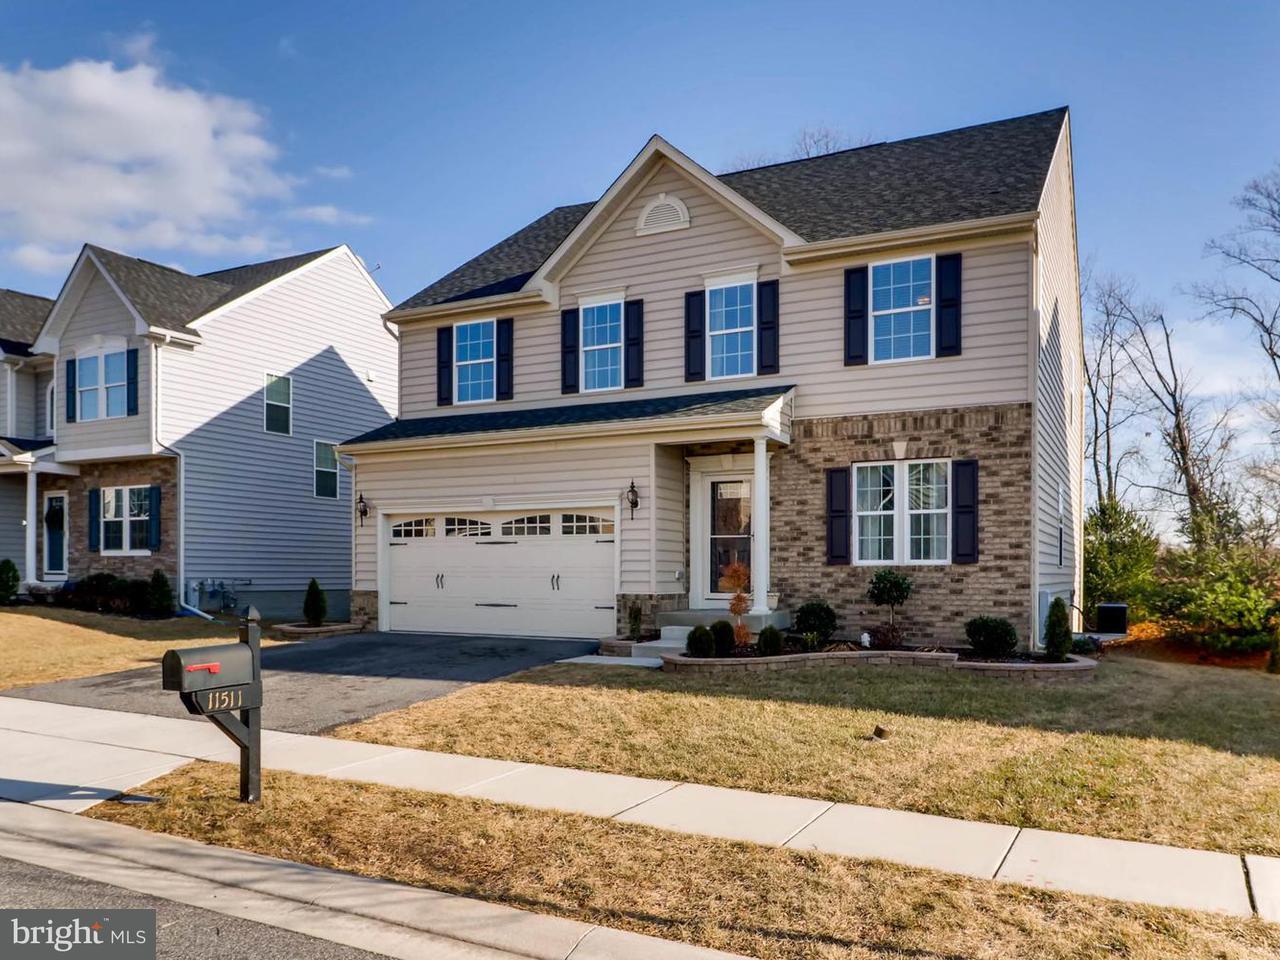 Частный односемейный дом для того Продажа на 11511 Ridgedale Drive 11511 Ridgedale Drive White Marsh, Мэриленд 21162 Соединенные Штаты